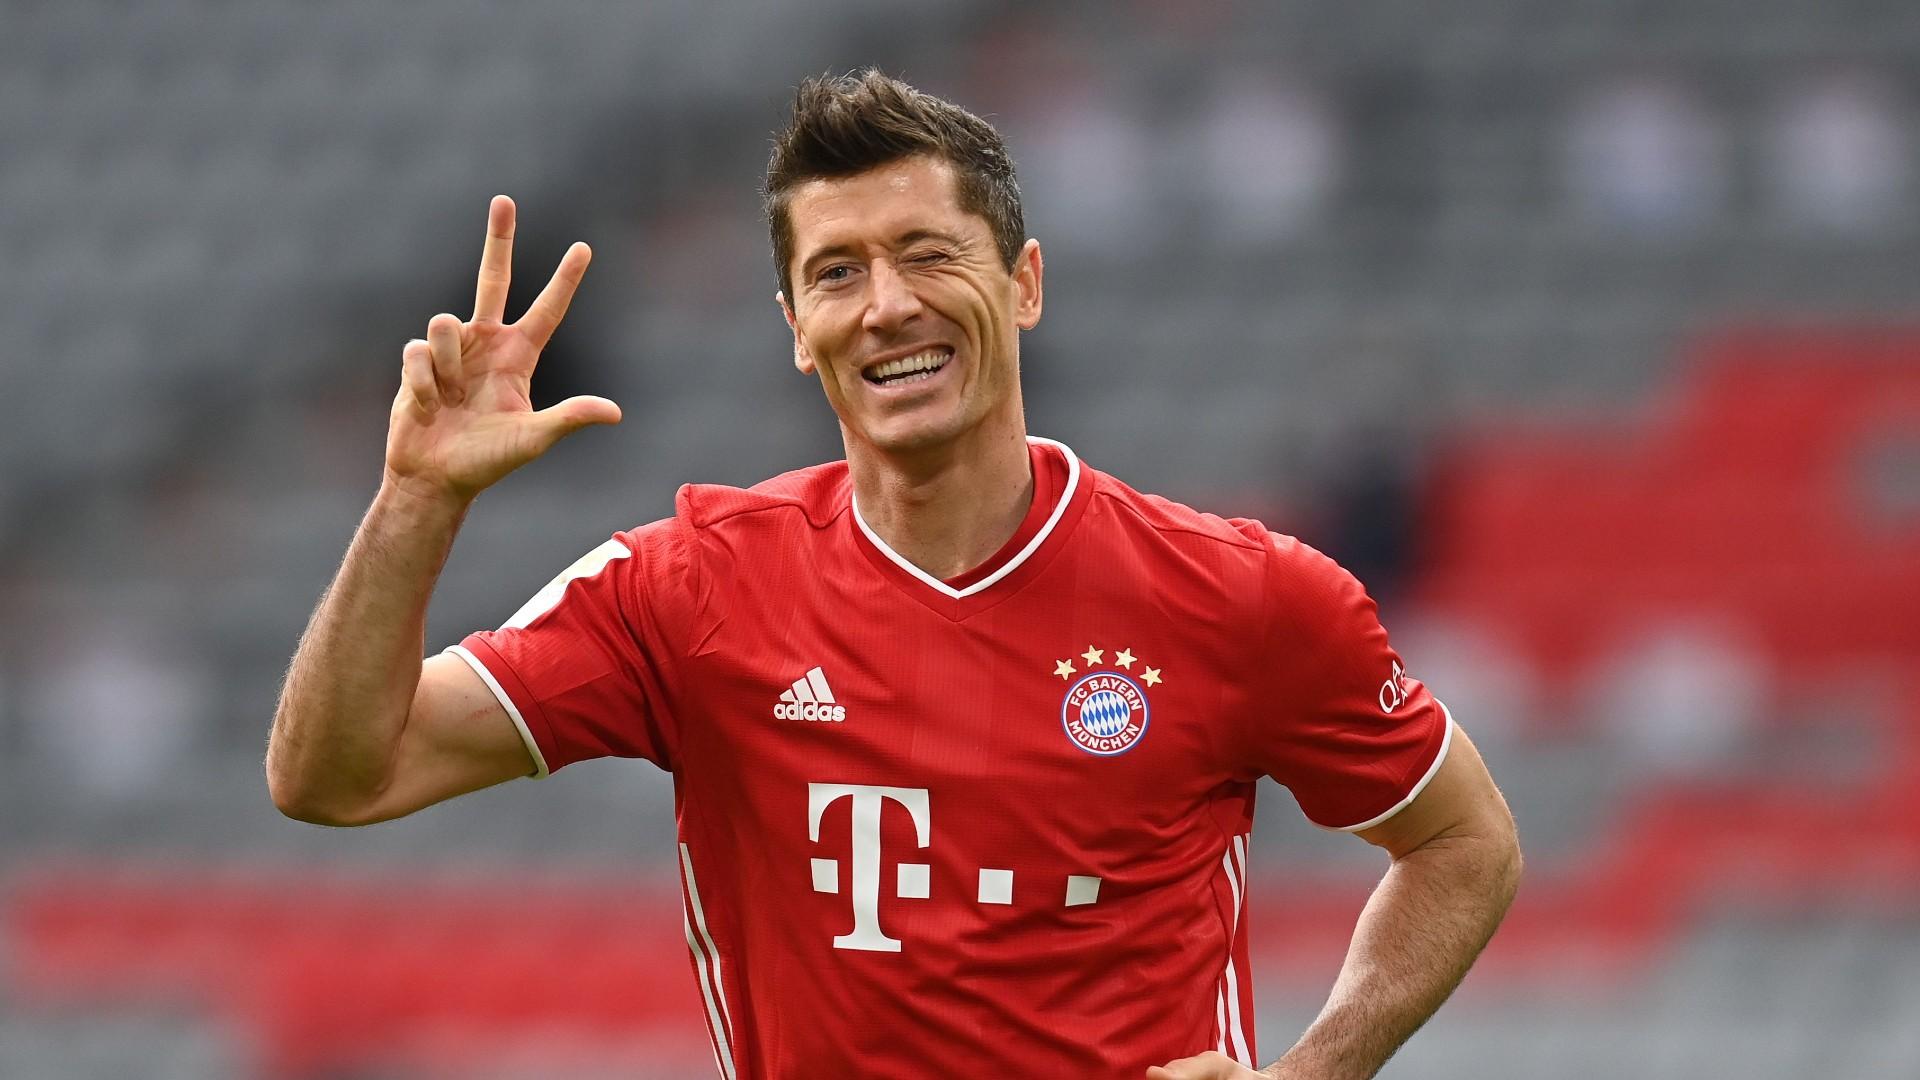 Lewandowski sets new Bundesliga goal record as Bayern Munich thrash  Eintracht Frankfurt | Goal.com